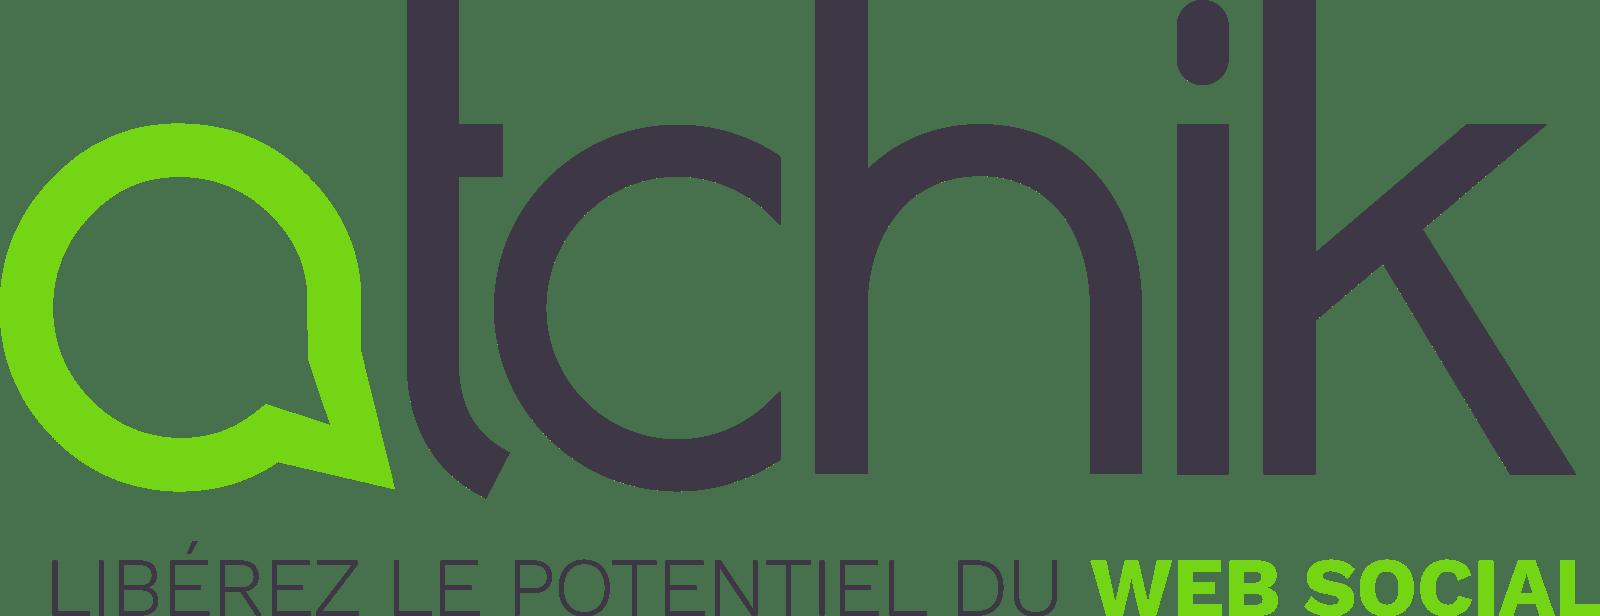 Grand logo Atchik avec baseline